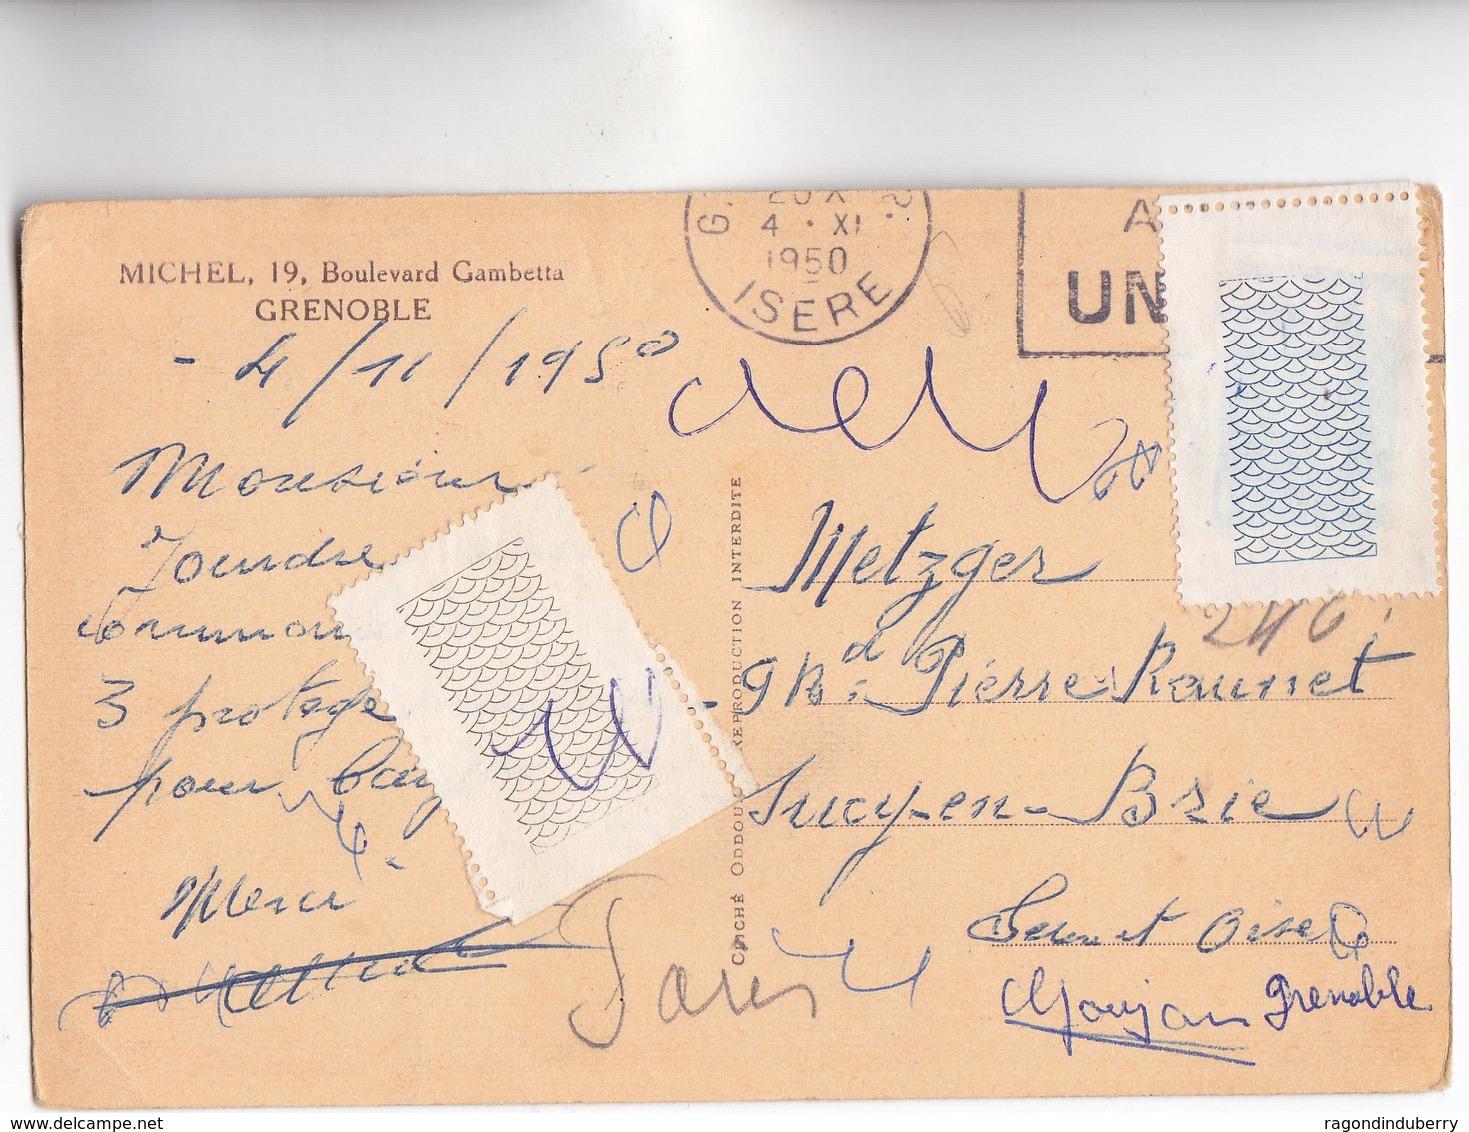 CPA - 38 - GRENOBLE - MICHEL TOUT POUR LA MUSIQUE - PIANOS, PHONOS 19, Boulevard Gambetta - CARTE RARE - 1950 - Grenoble